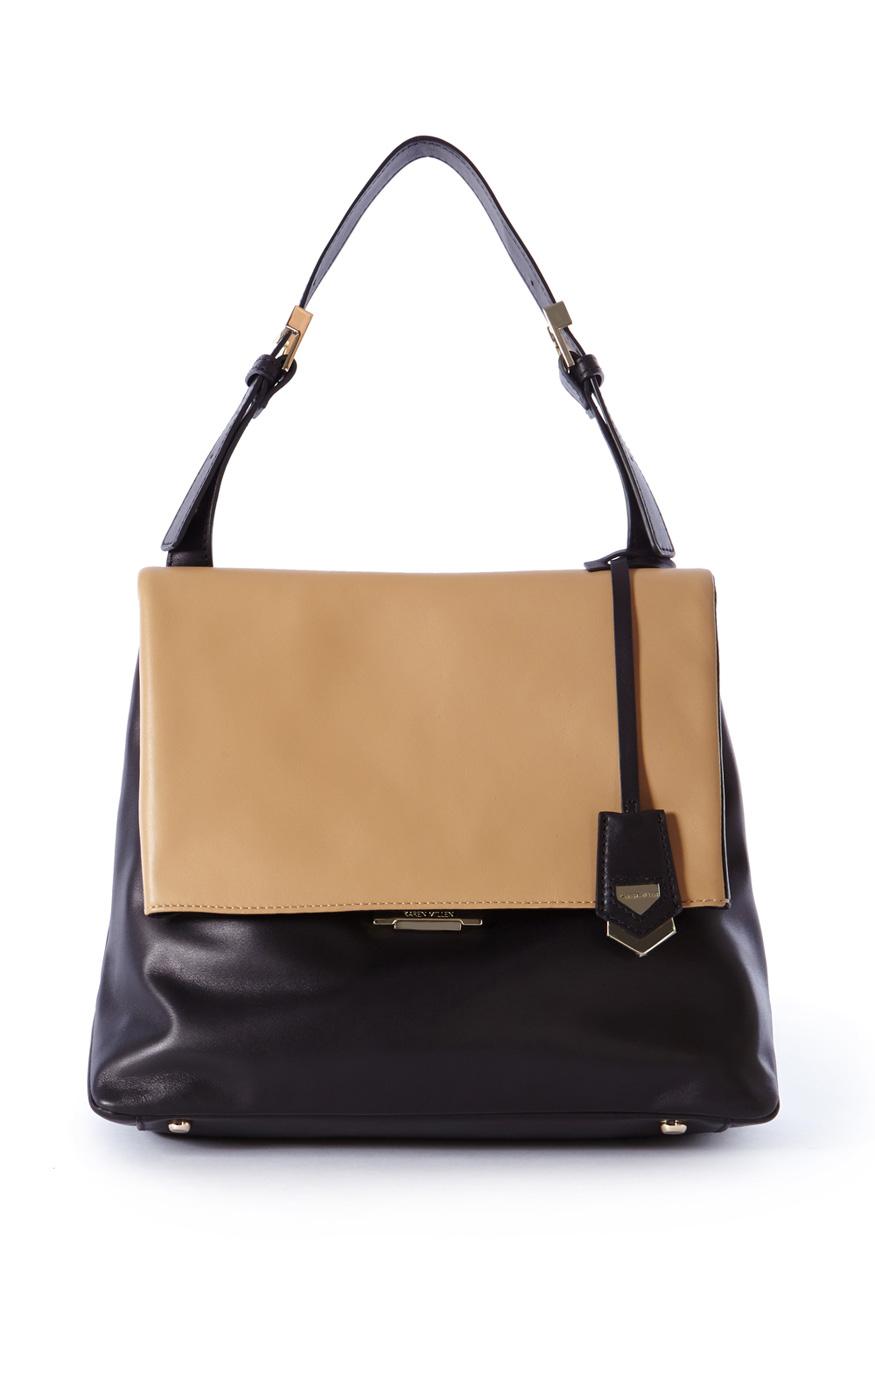 d7a007efcf Karen Millen Two-tone Medium Leather Tote in Black - Lyst